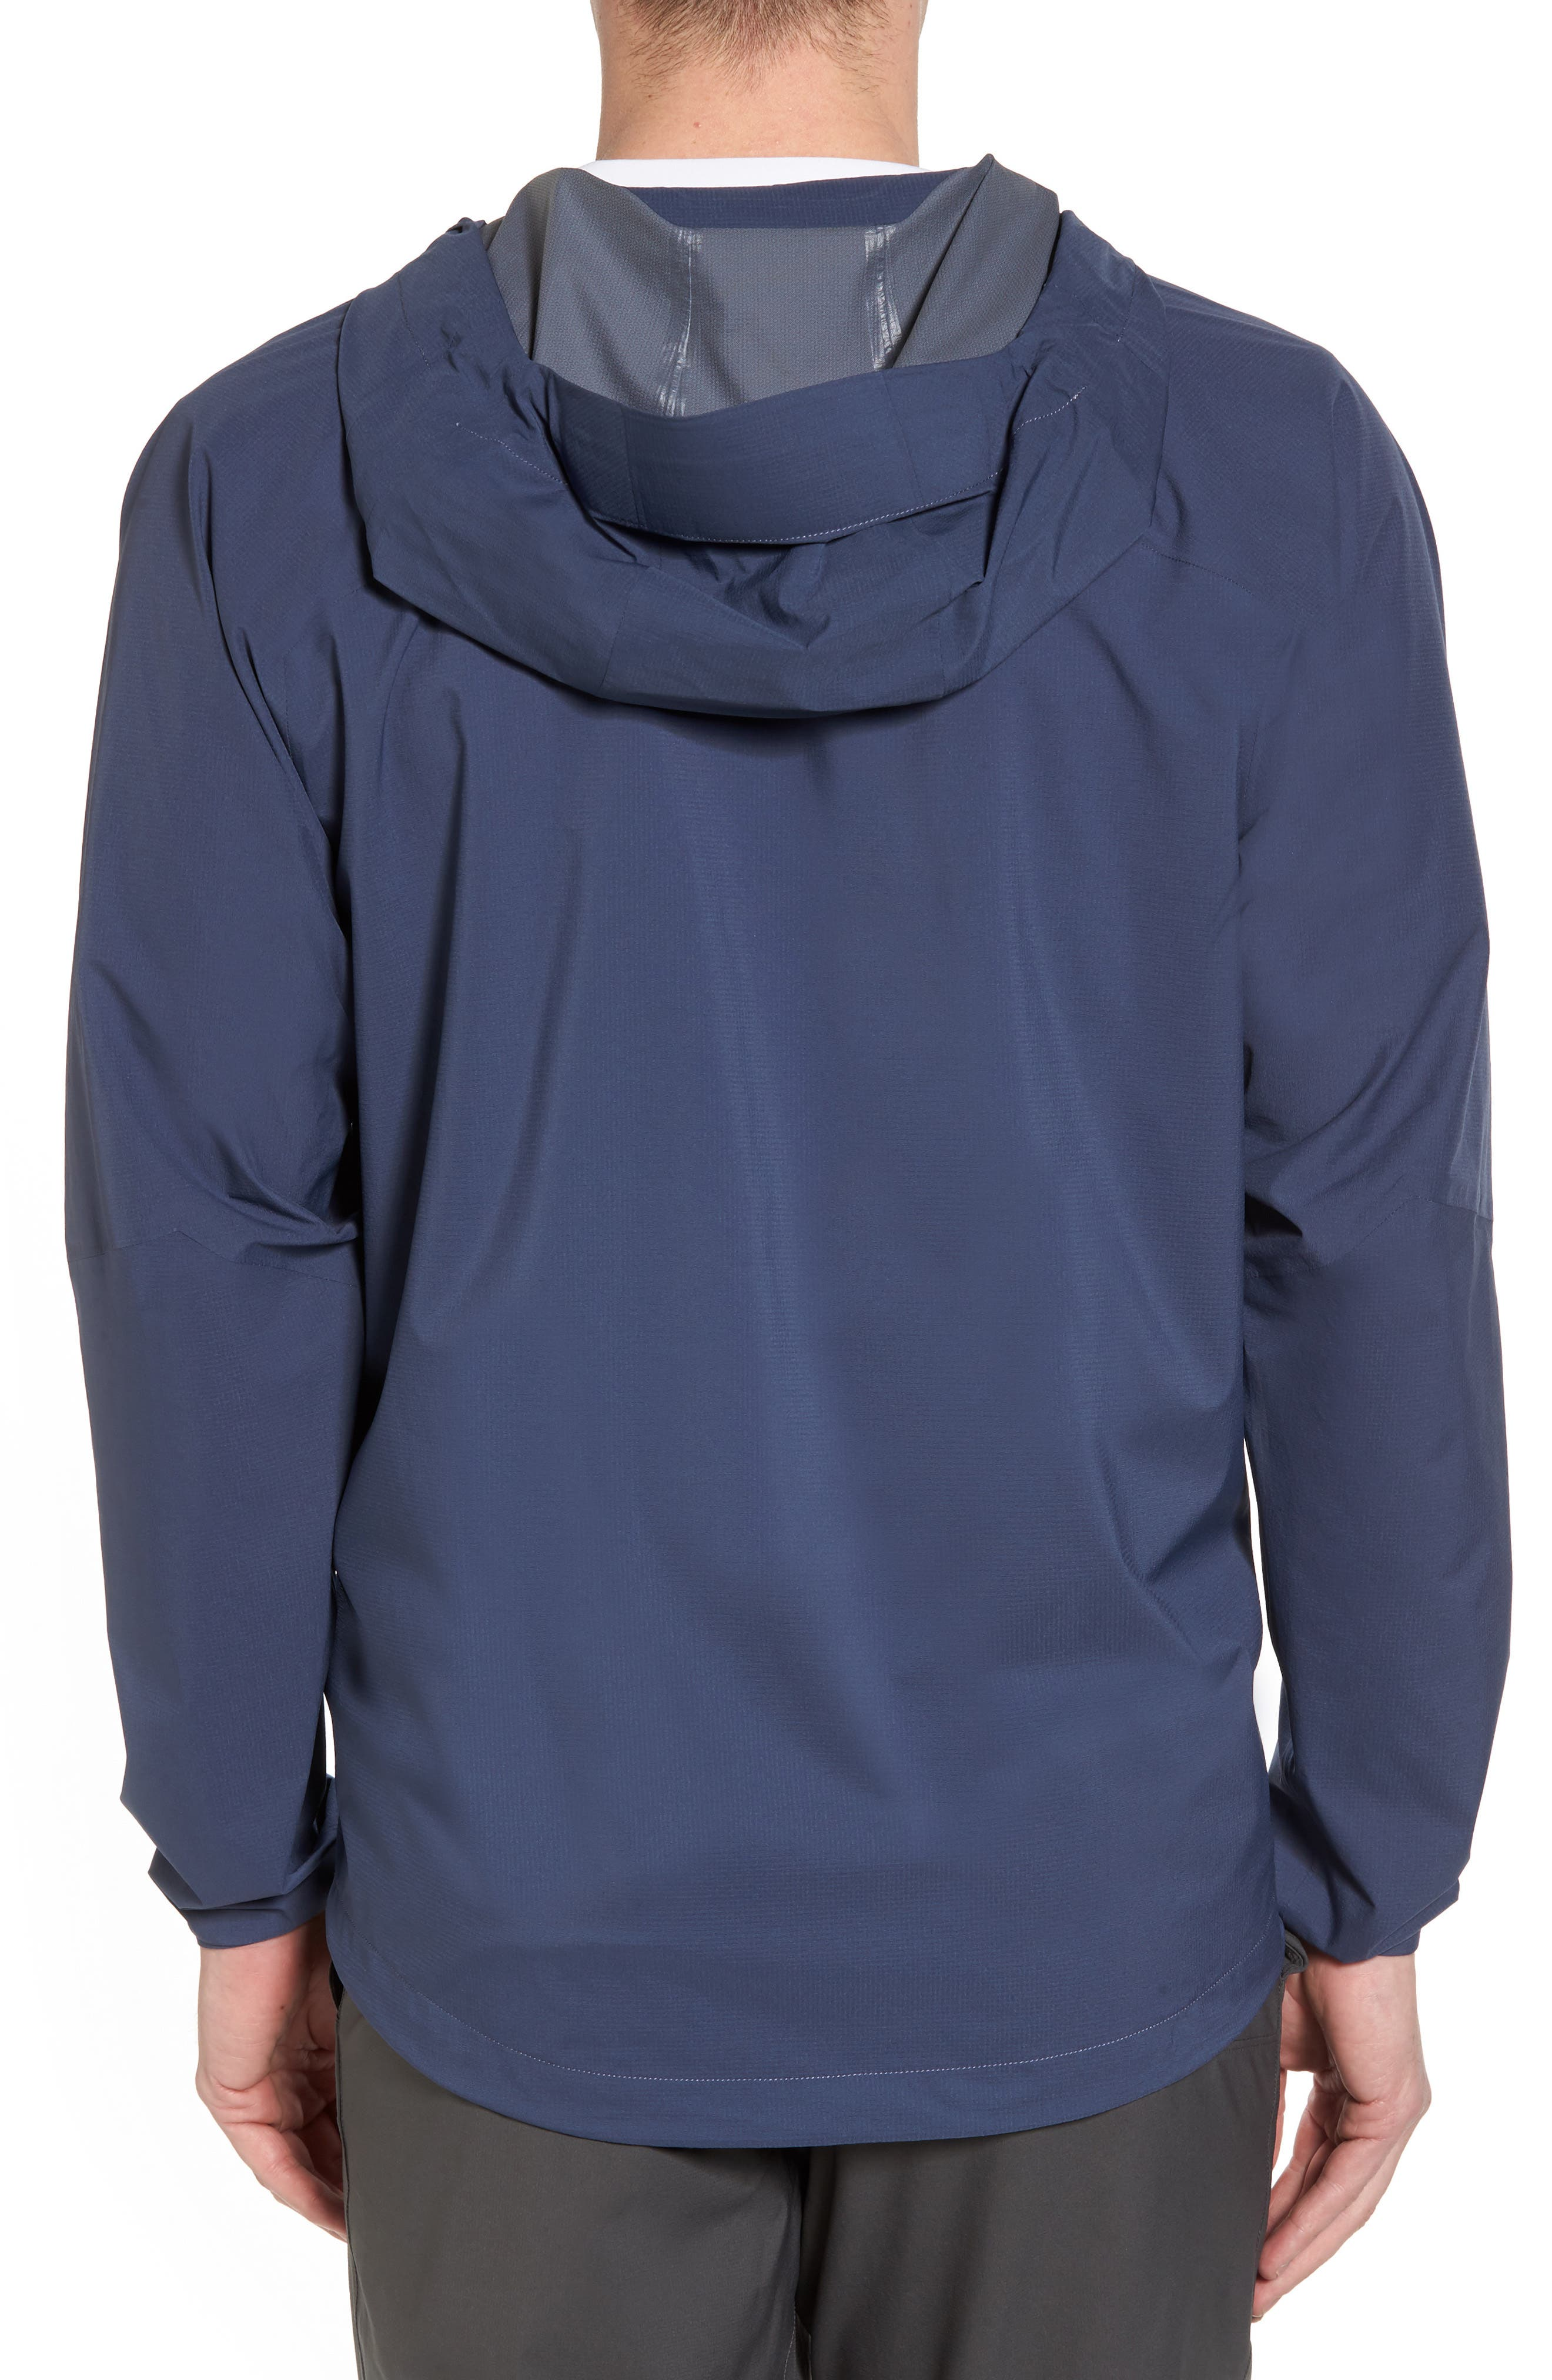 Stretch Rainshadow Jacket,                             Alternate thumbnail 2, color,                             Dolomite Blue